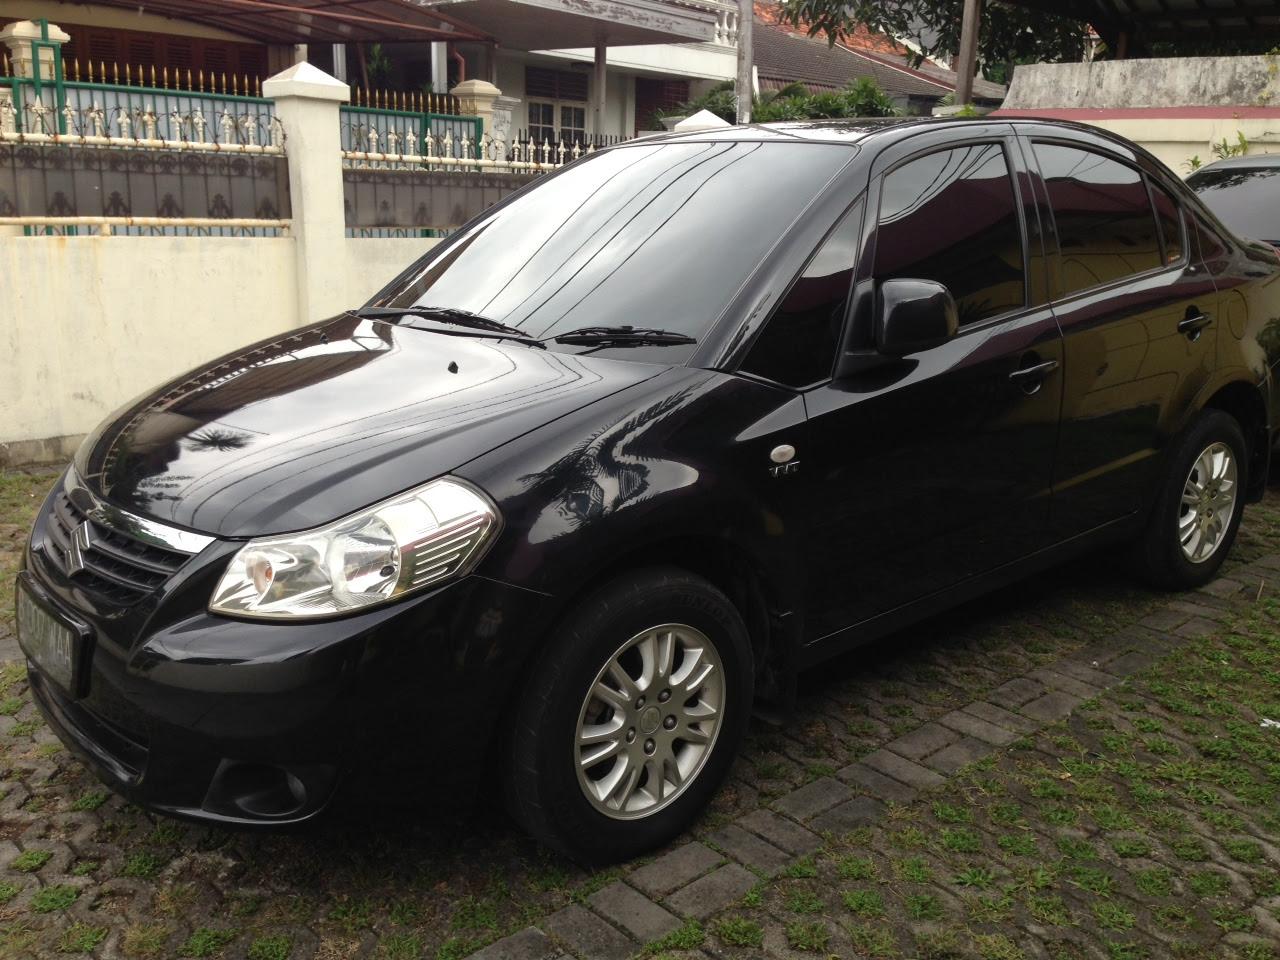 Modifikasi Mobil Brio Satya E - Naskah c